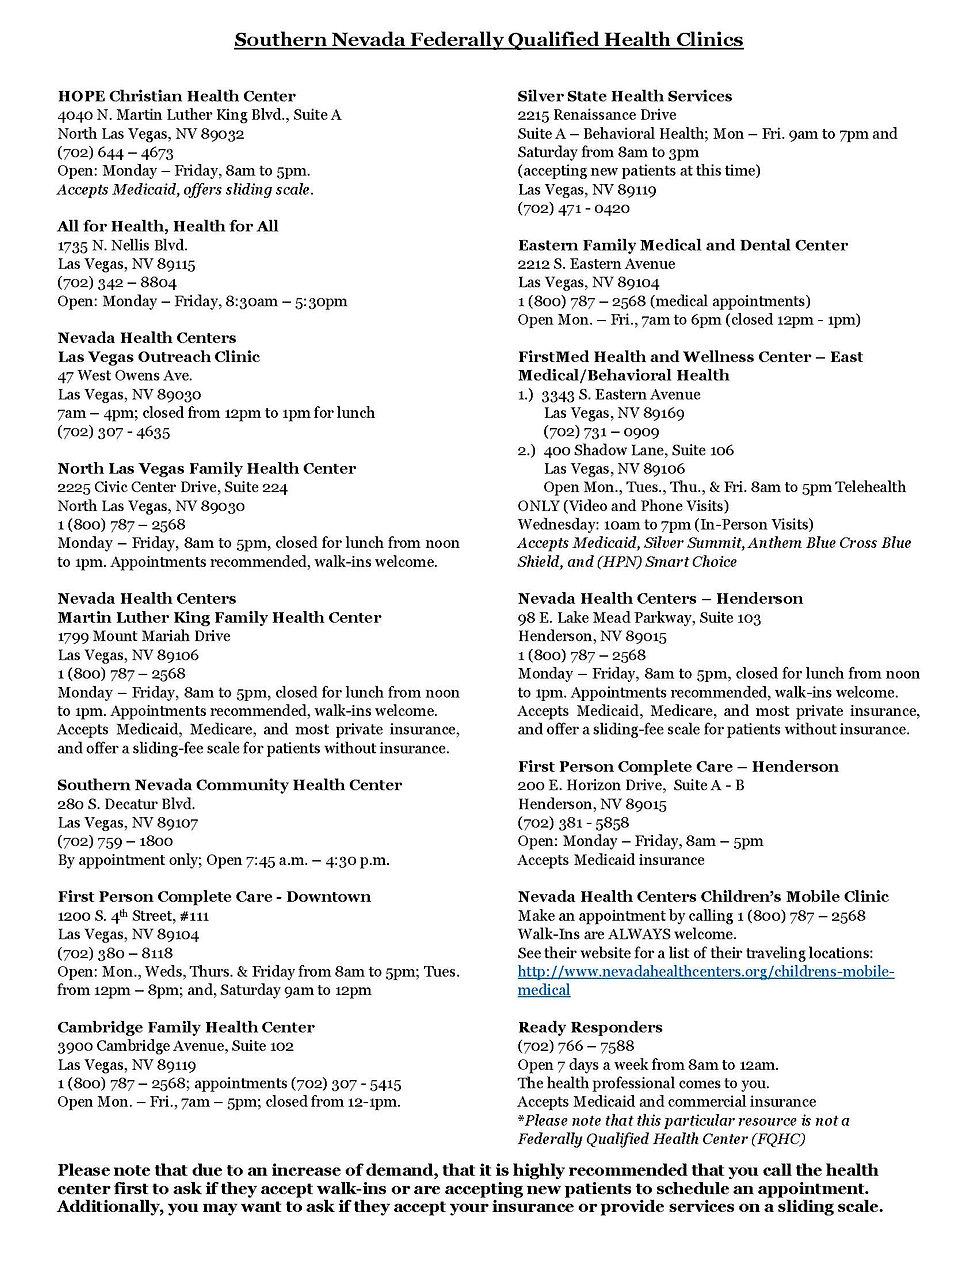 FQHC List Southern Nevada.jpg